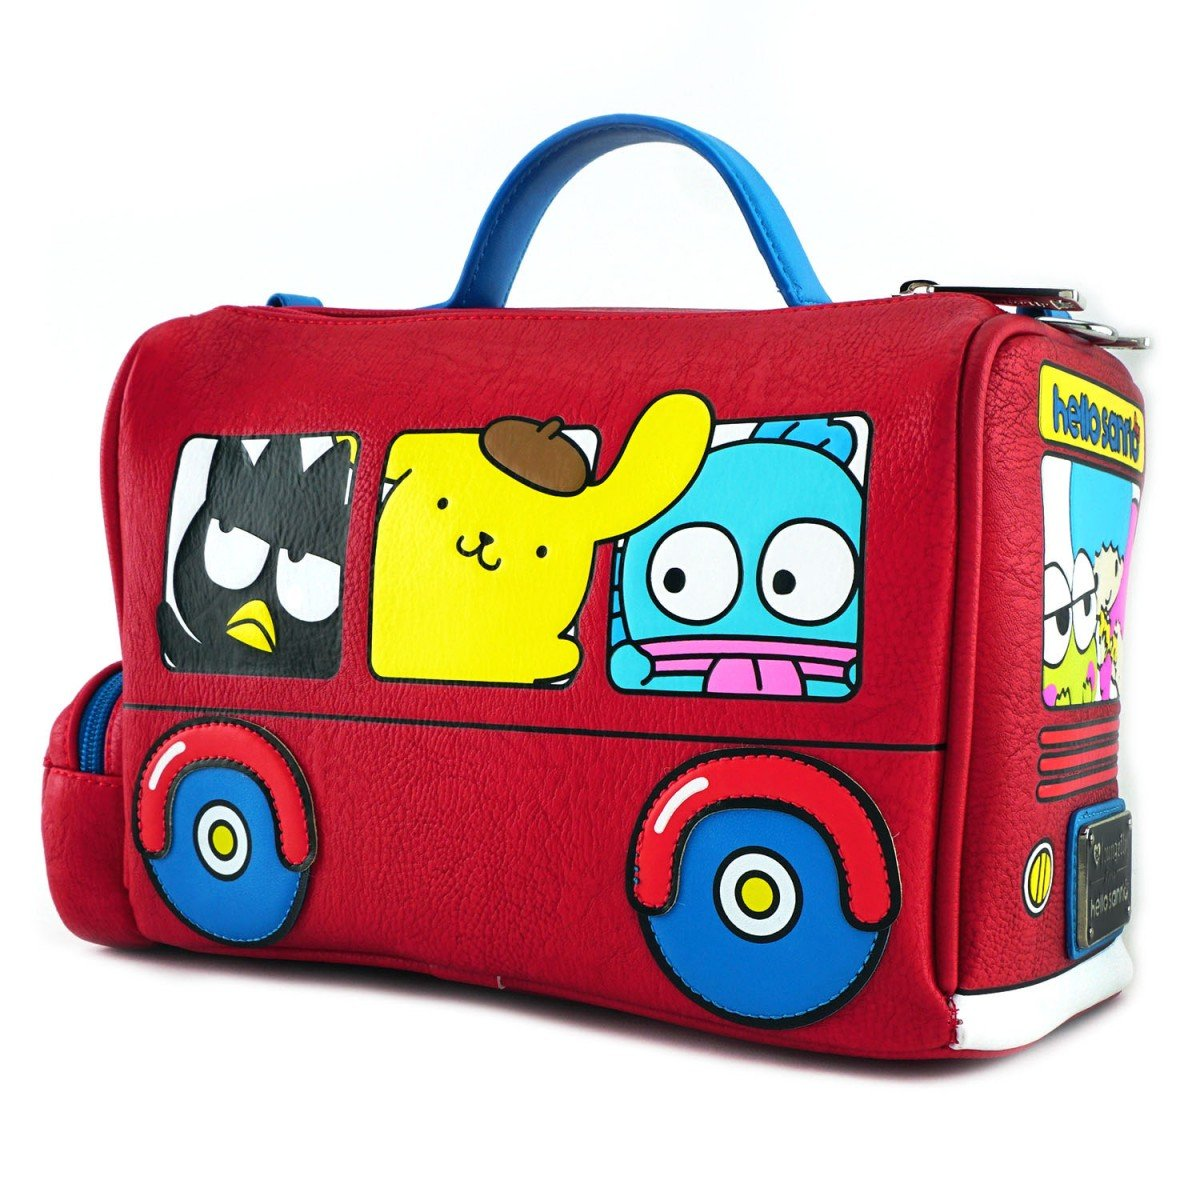 3c03d1fcb23b Loungefly x Hello Sanrio Bus Crossbody Bag  Handbags  Amazon.com